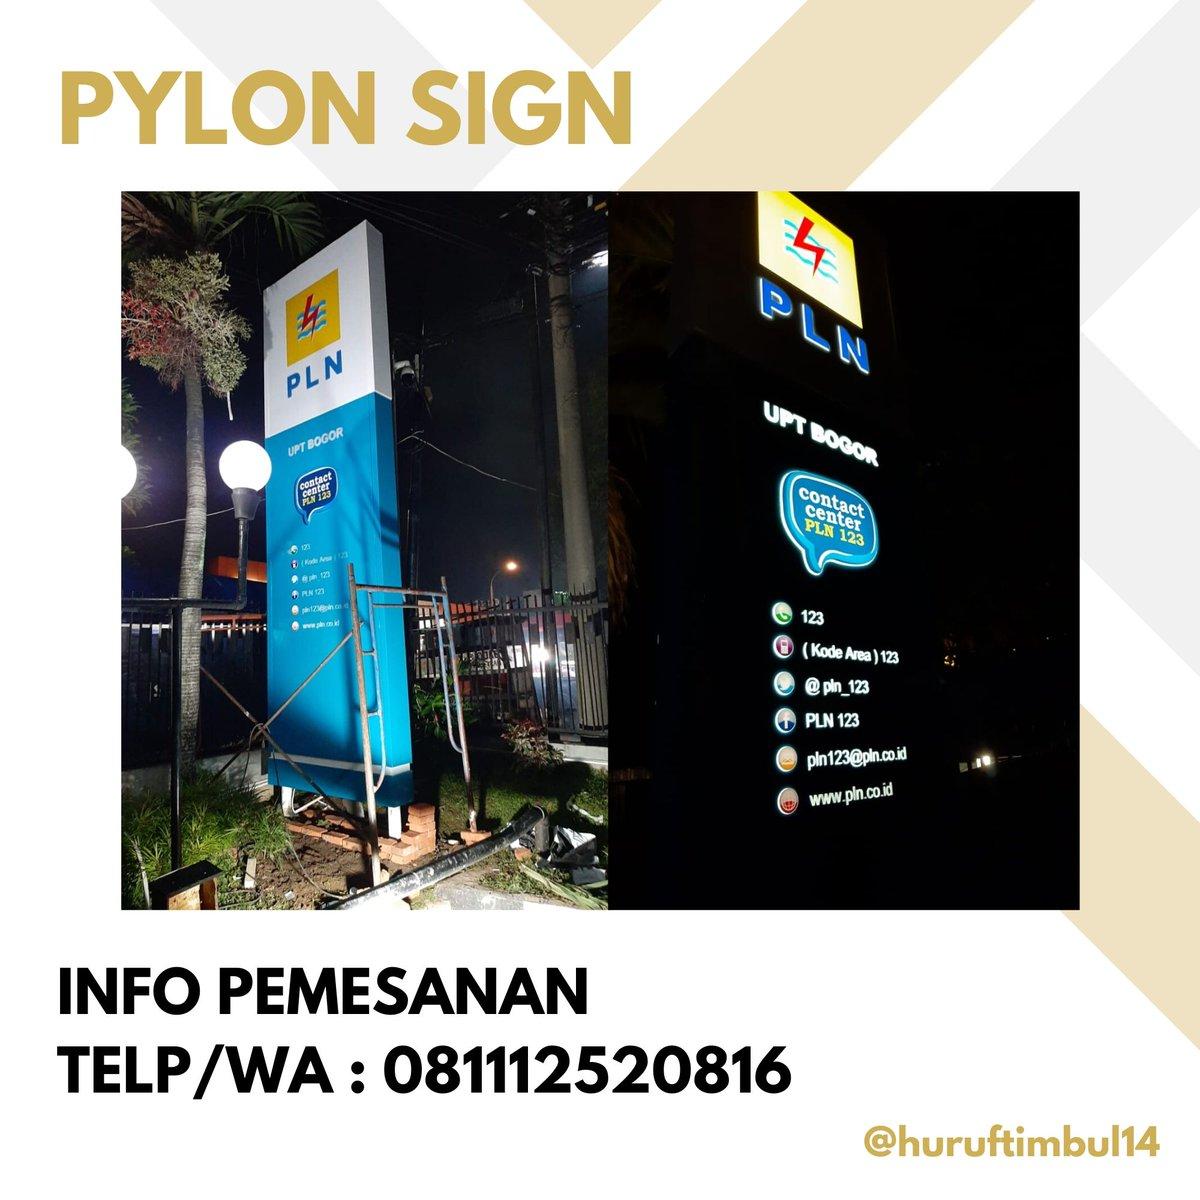 JASA PEMBUATAN TOTEM/PYLON Kami membuat berbagai macam totem/pylon seperti pylon PLN, SPBU, dan lain lain.    Info Hubungi : Tlp/WA: 081112520816/081316140397 Info: Karawaci-Tangerang #totem #pylonsign #totemplnpic.twitter.com/eUBiii3TKy